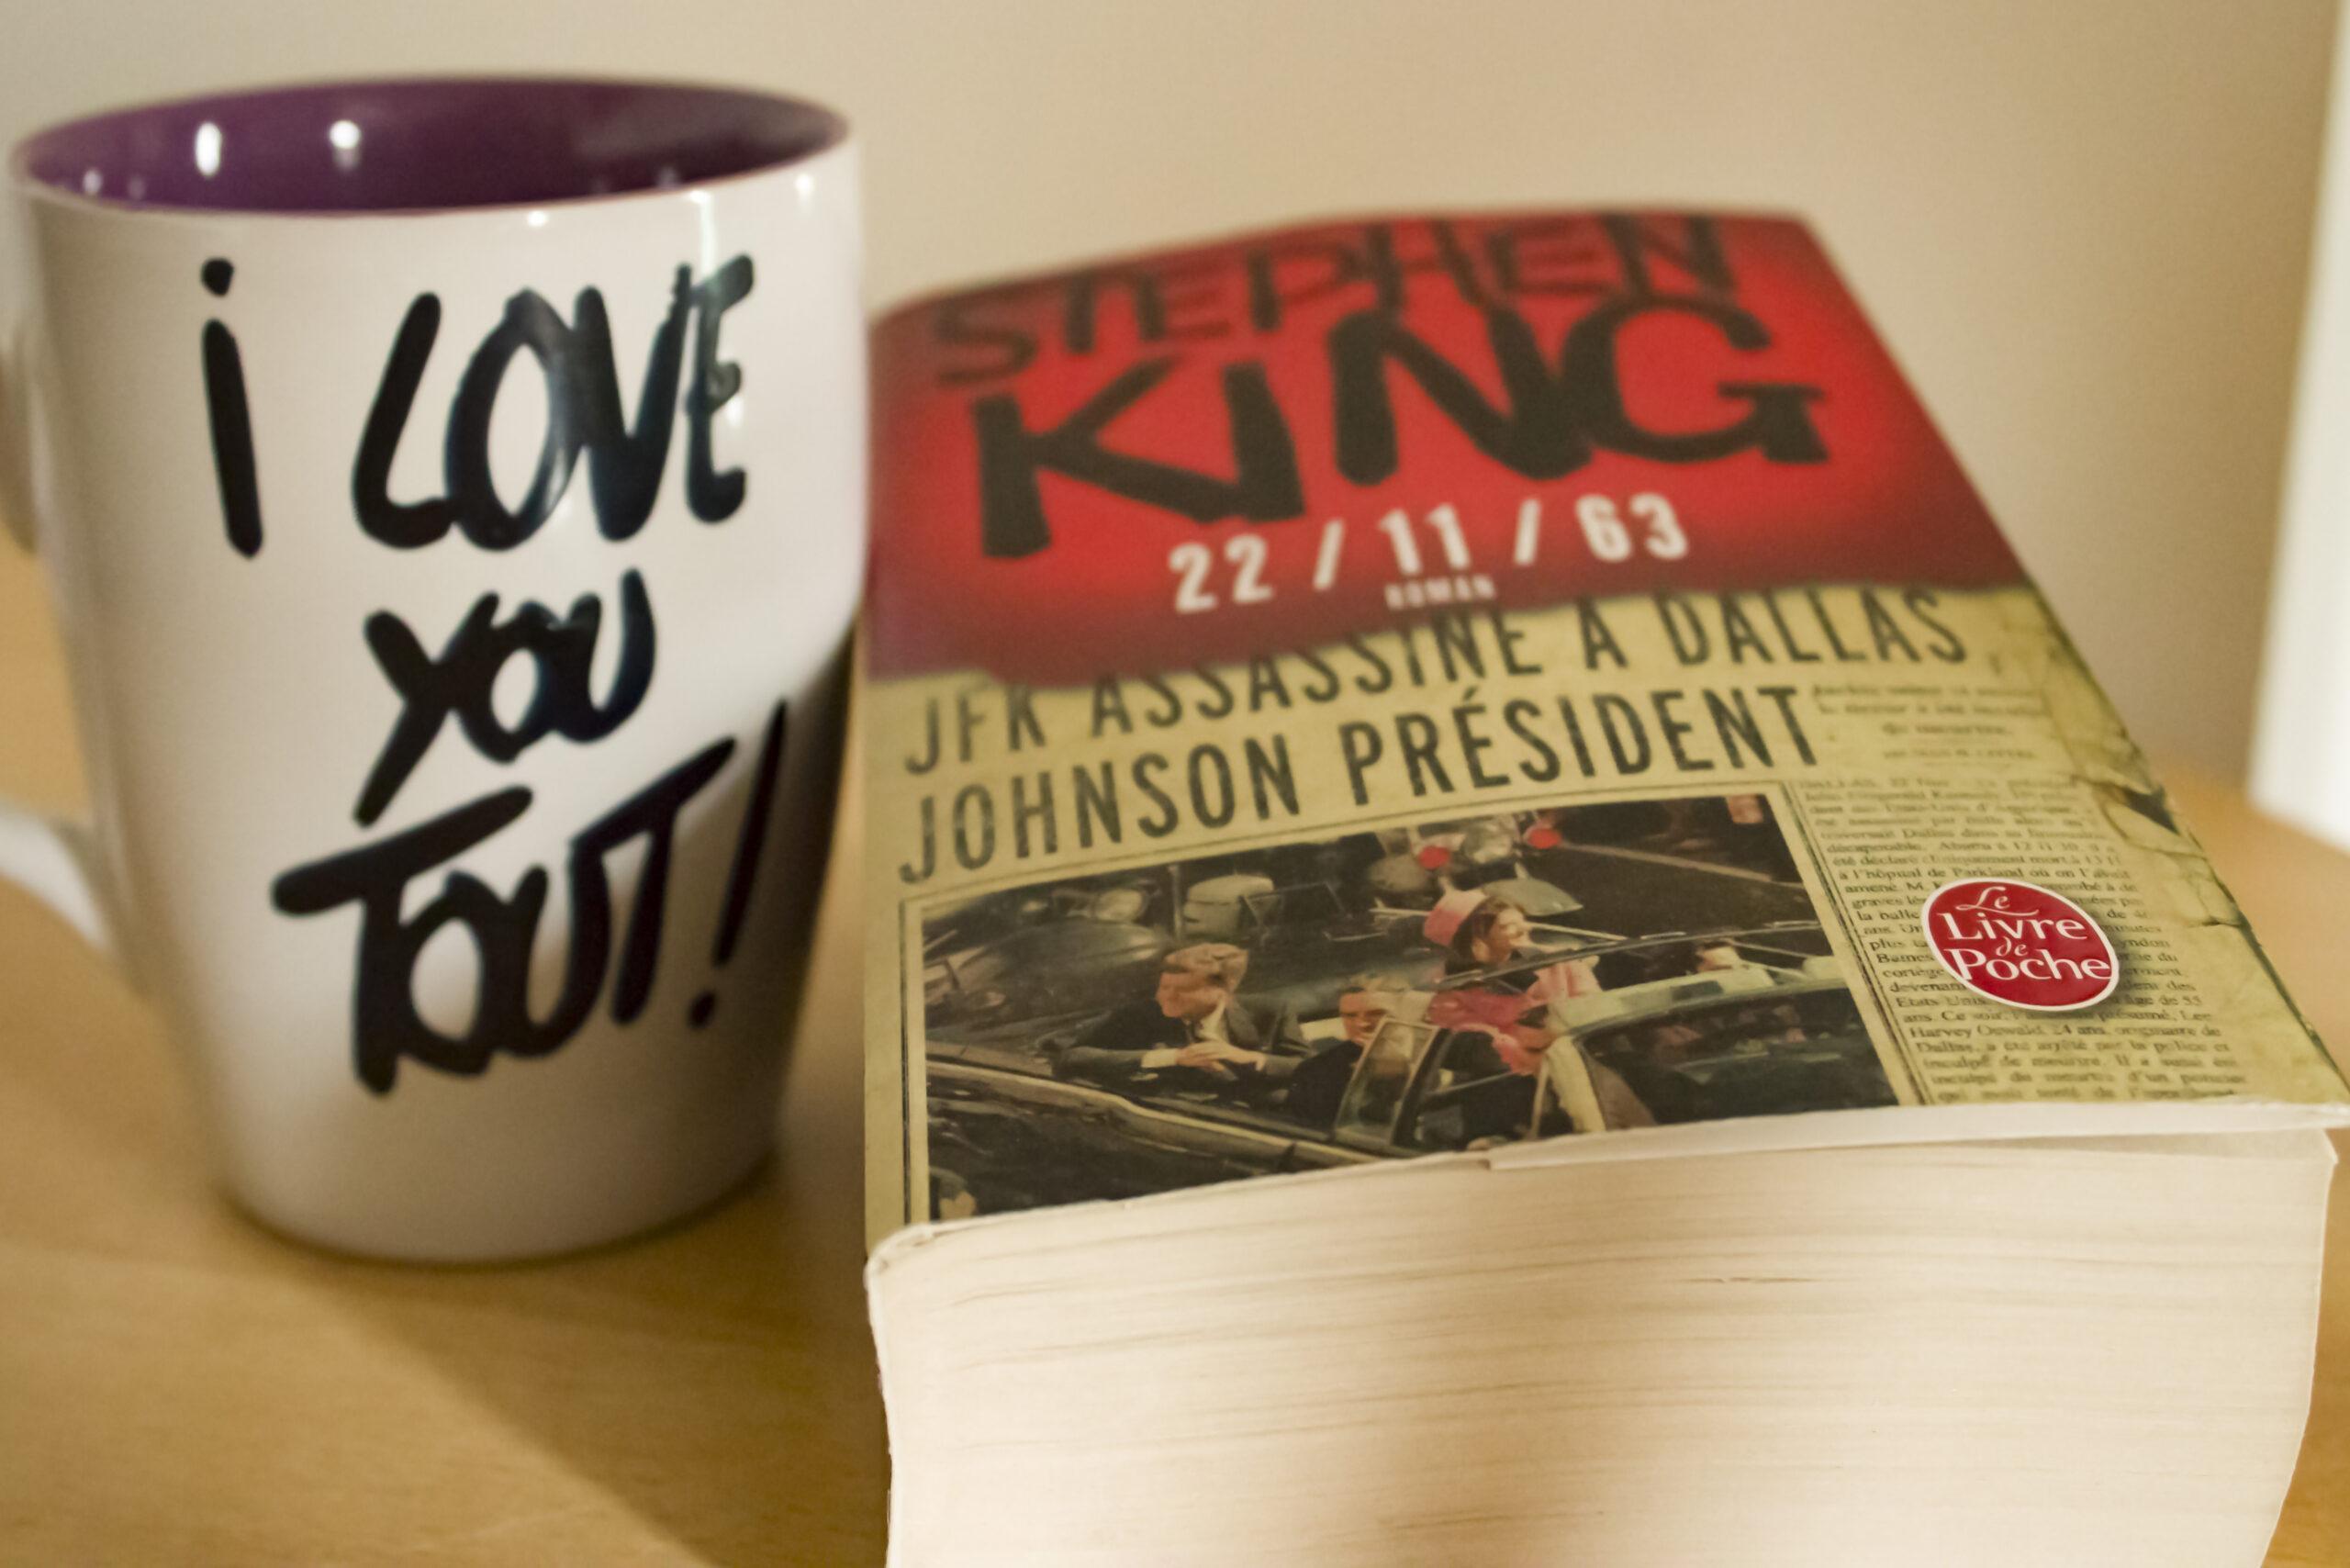 22/11/63 – Stephen King